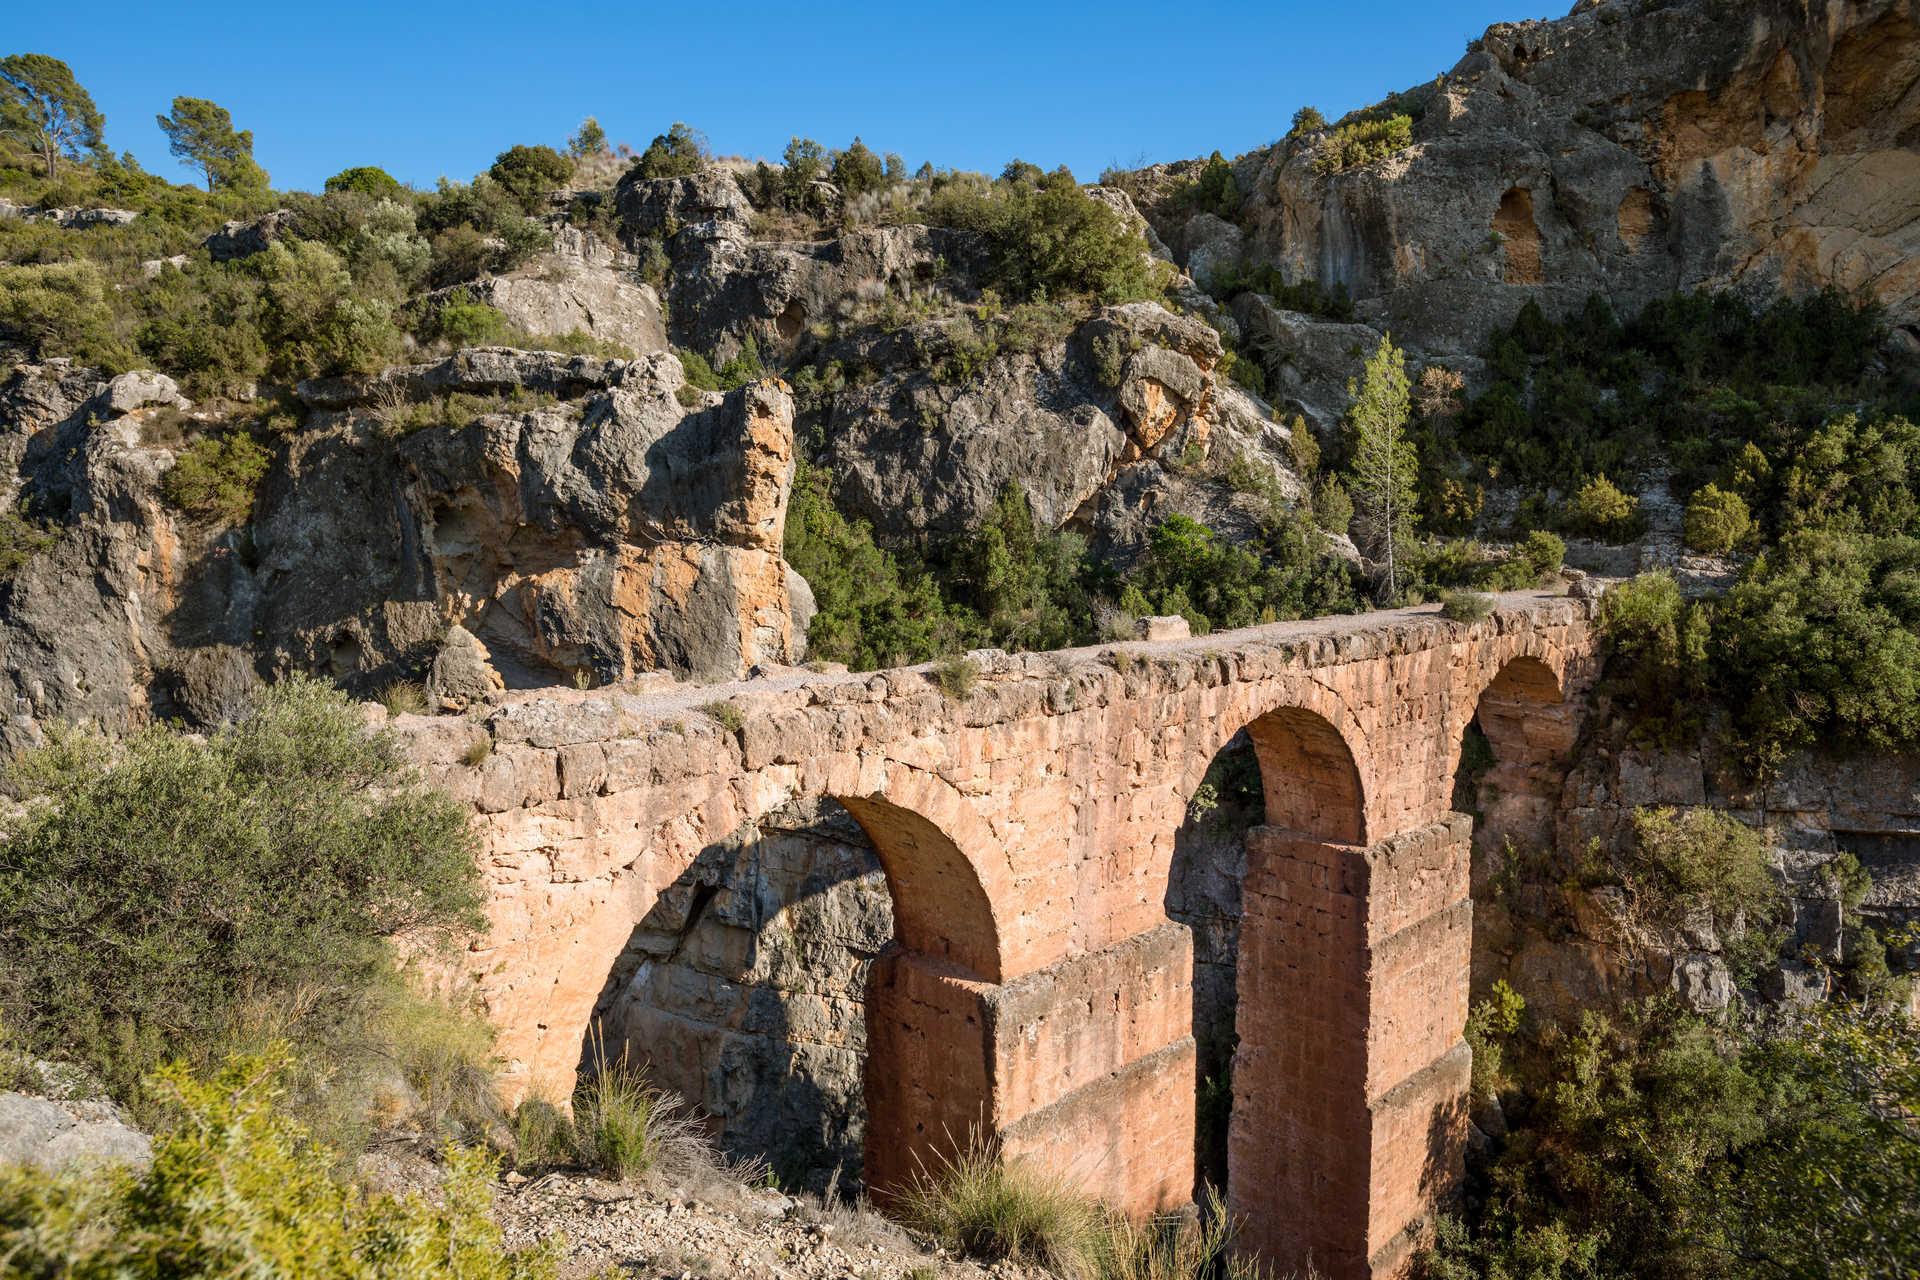 Aqueduc de Peña Cortada